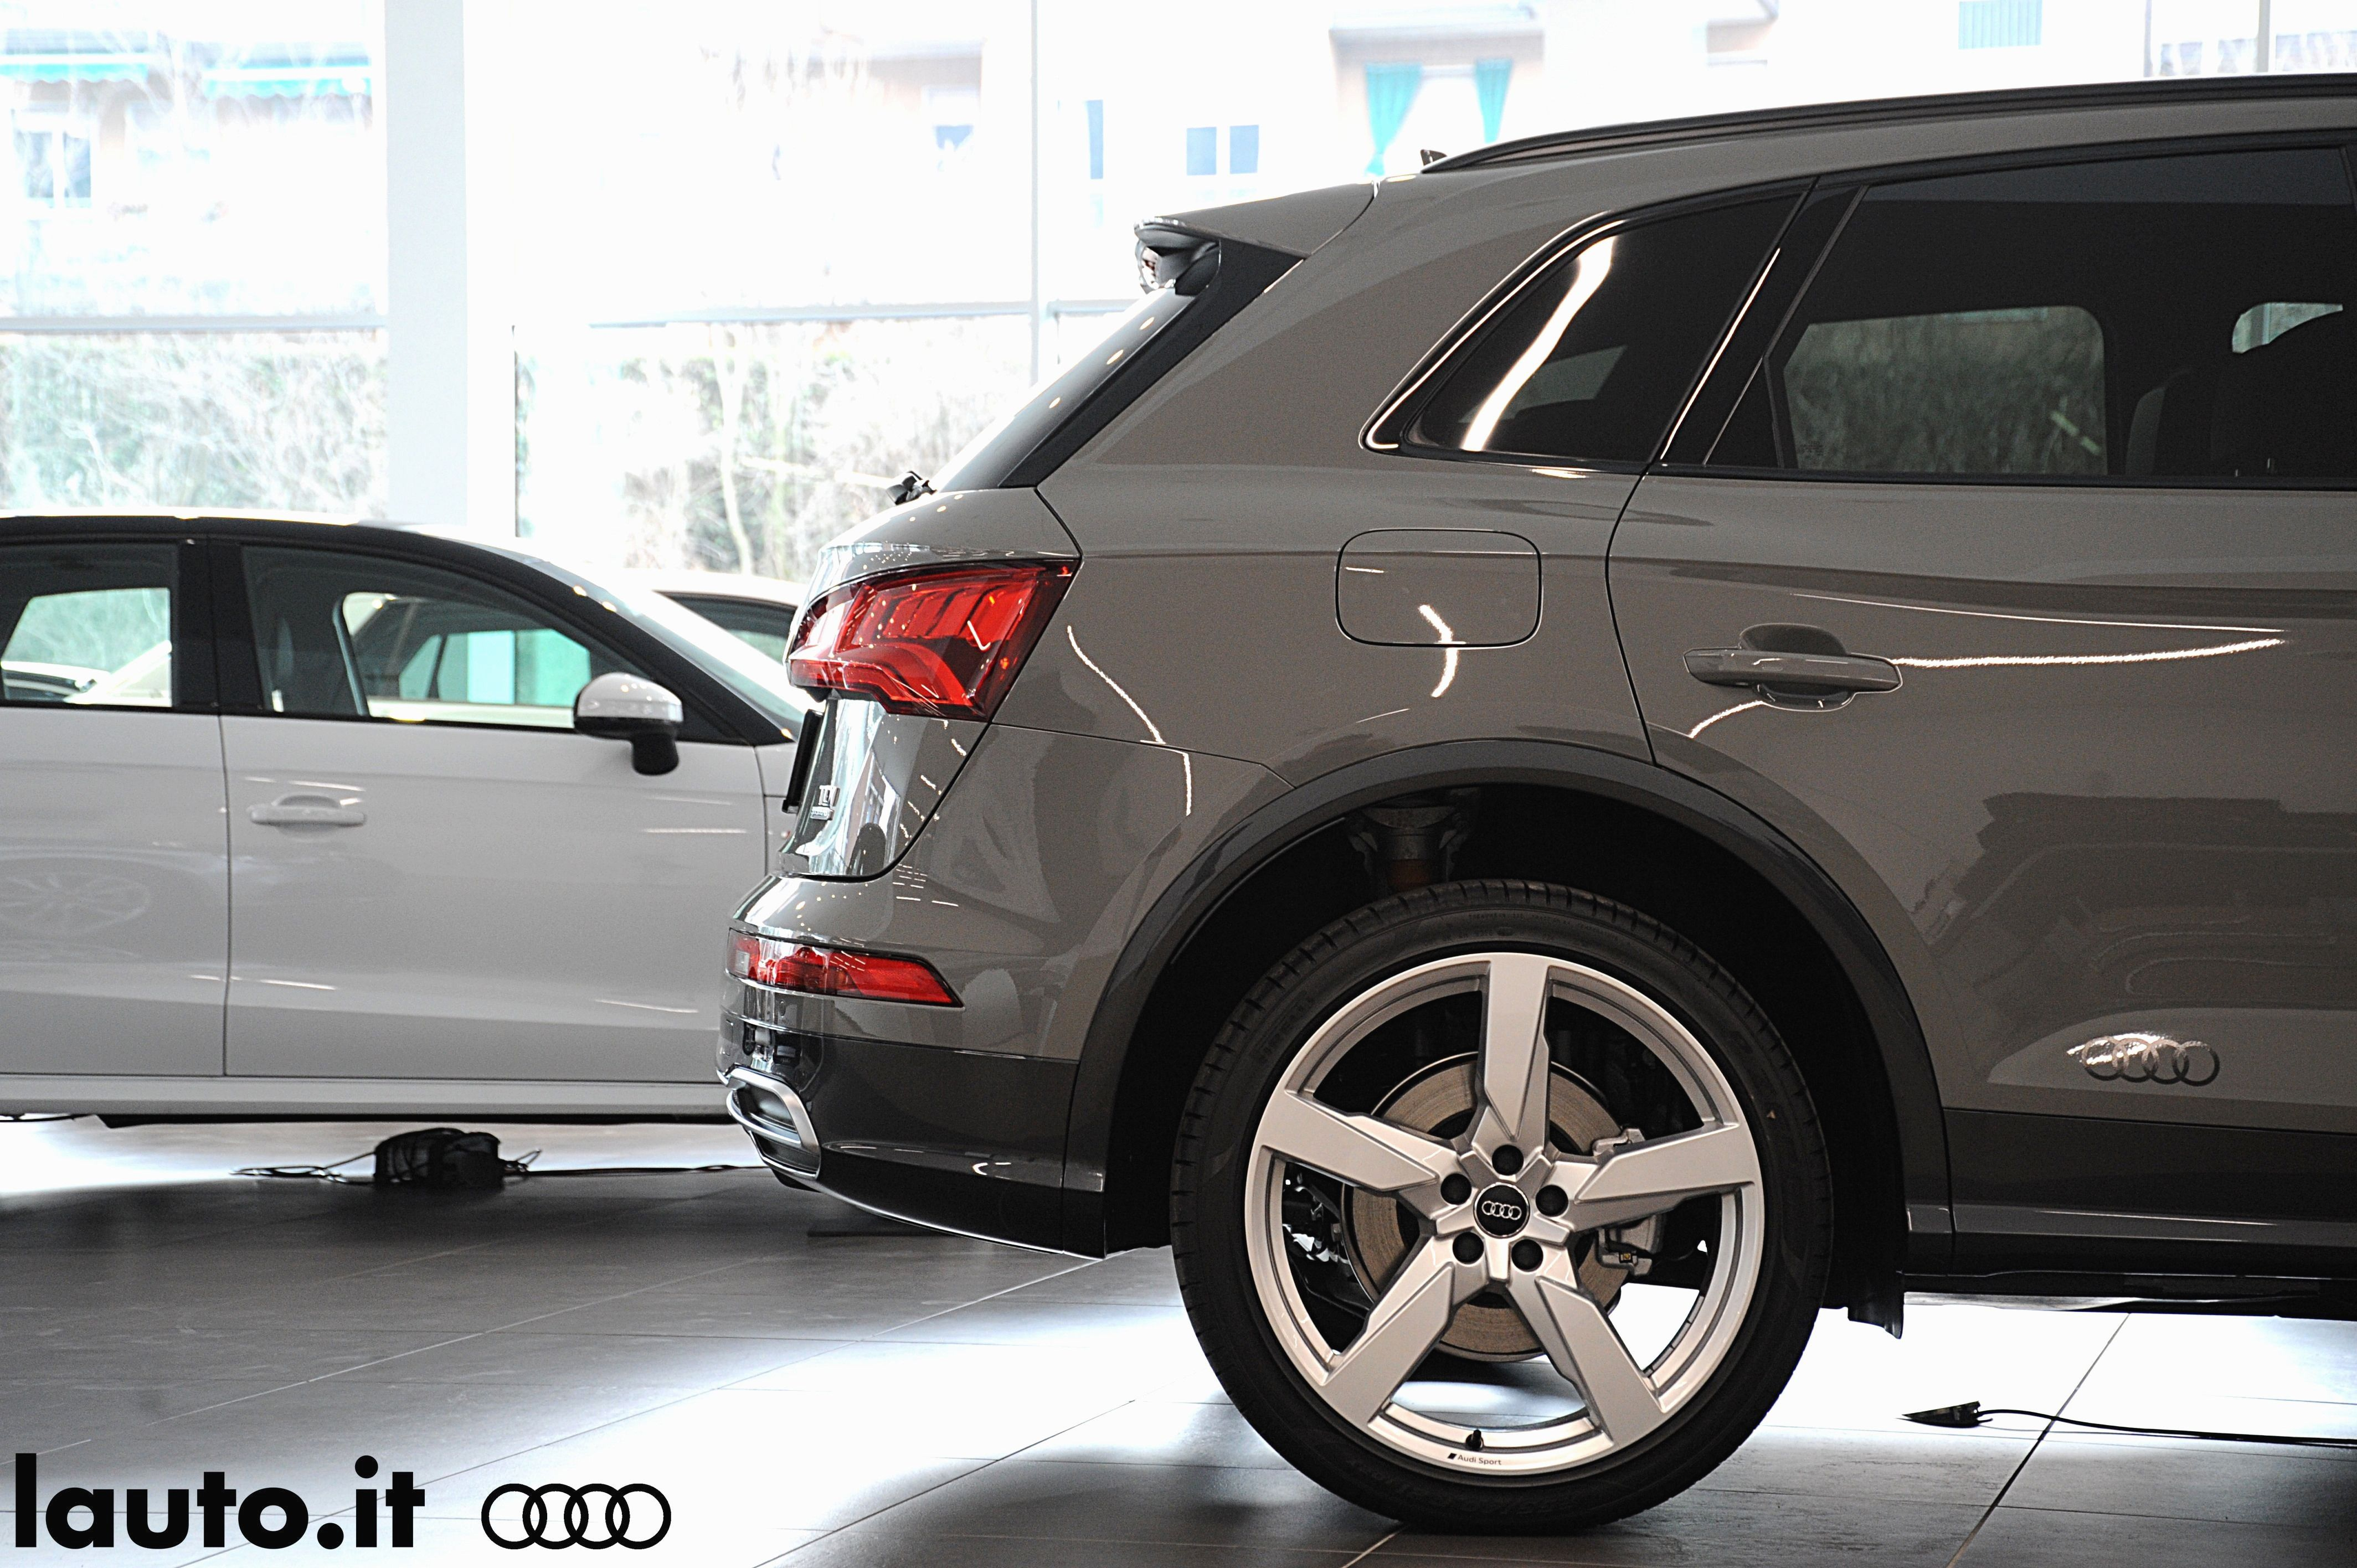 2020 Audi Q5 Audi Q5 Interior Elegant 2020 Audi Q5 Volvo V 60 Kombi Audi Buick Regal Gs New Cars